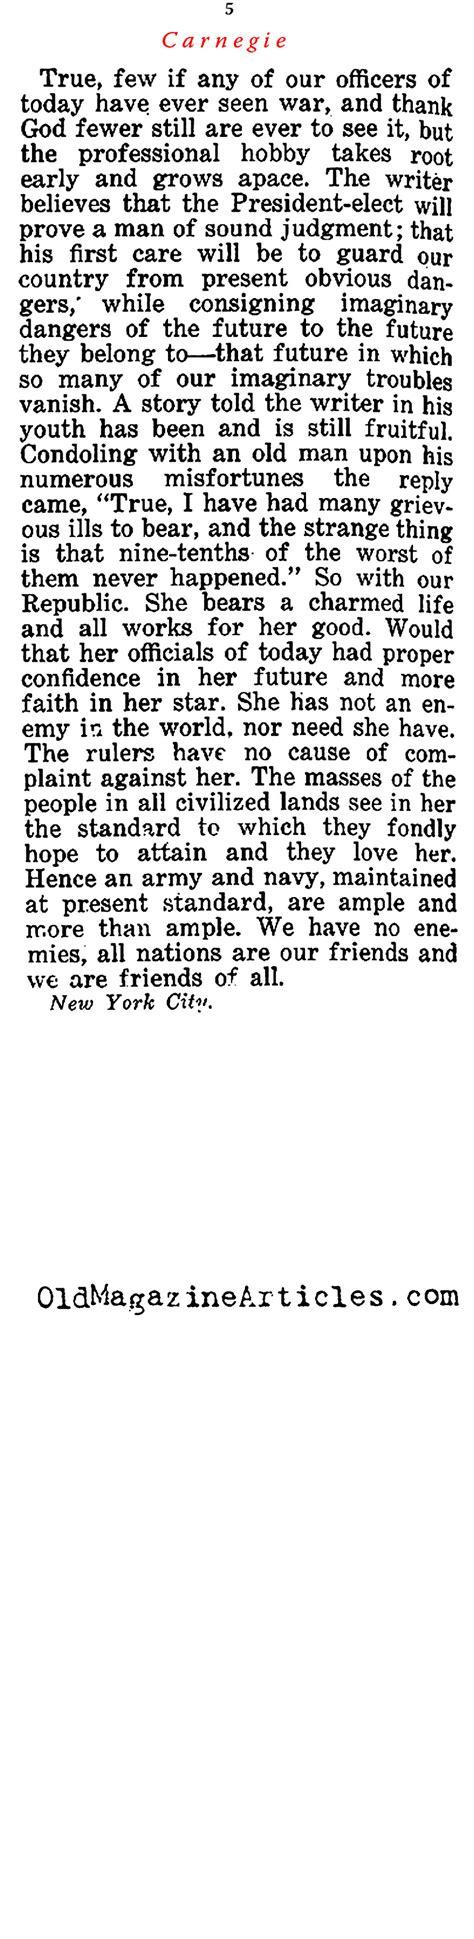 Andrew Carnegie Dbq Essay by Andrew Carnegie Essay